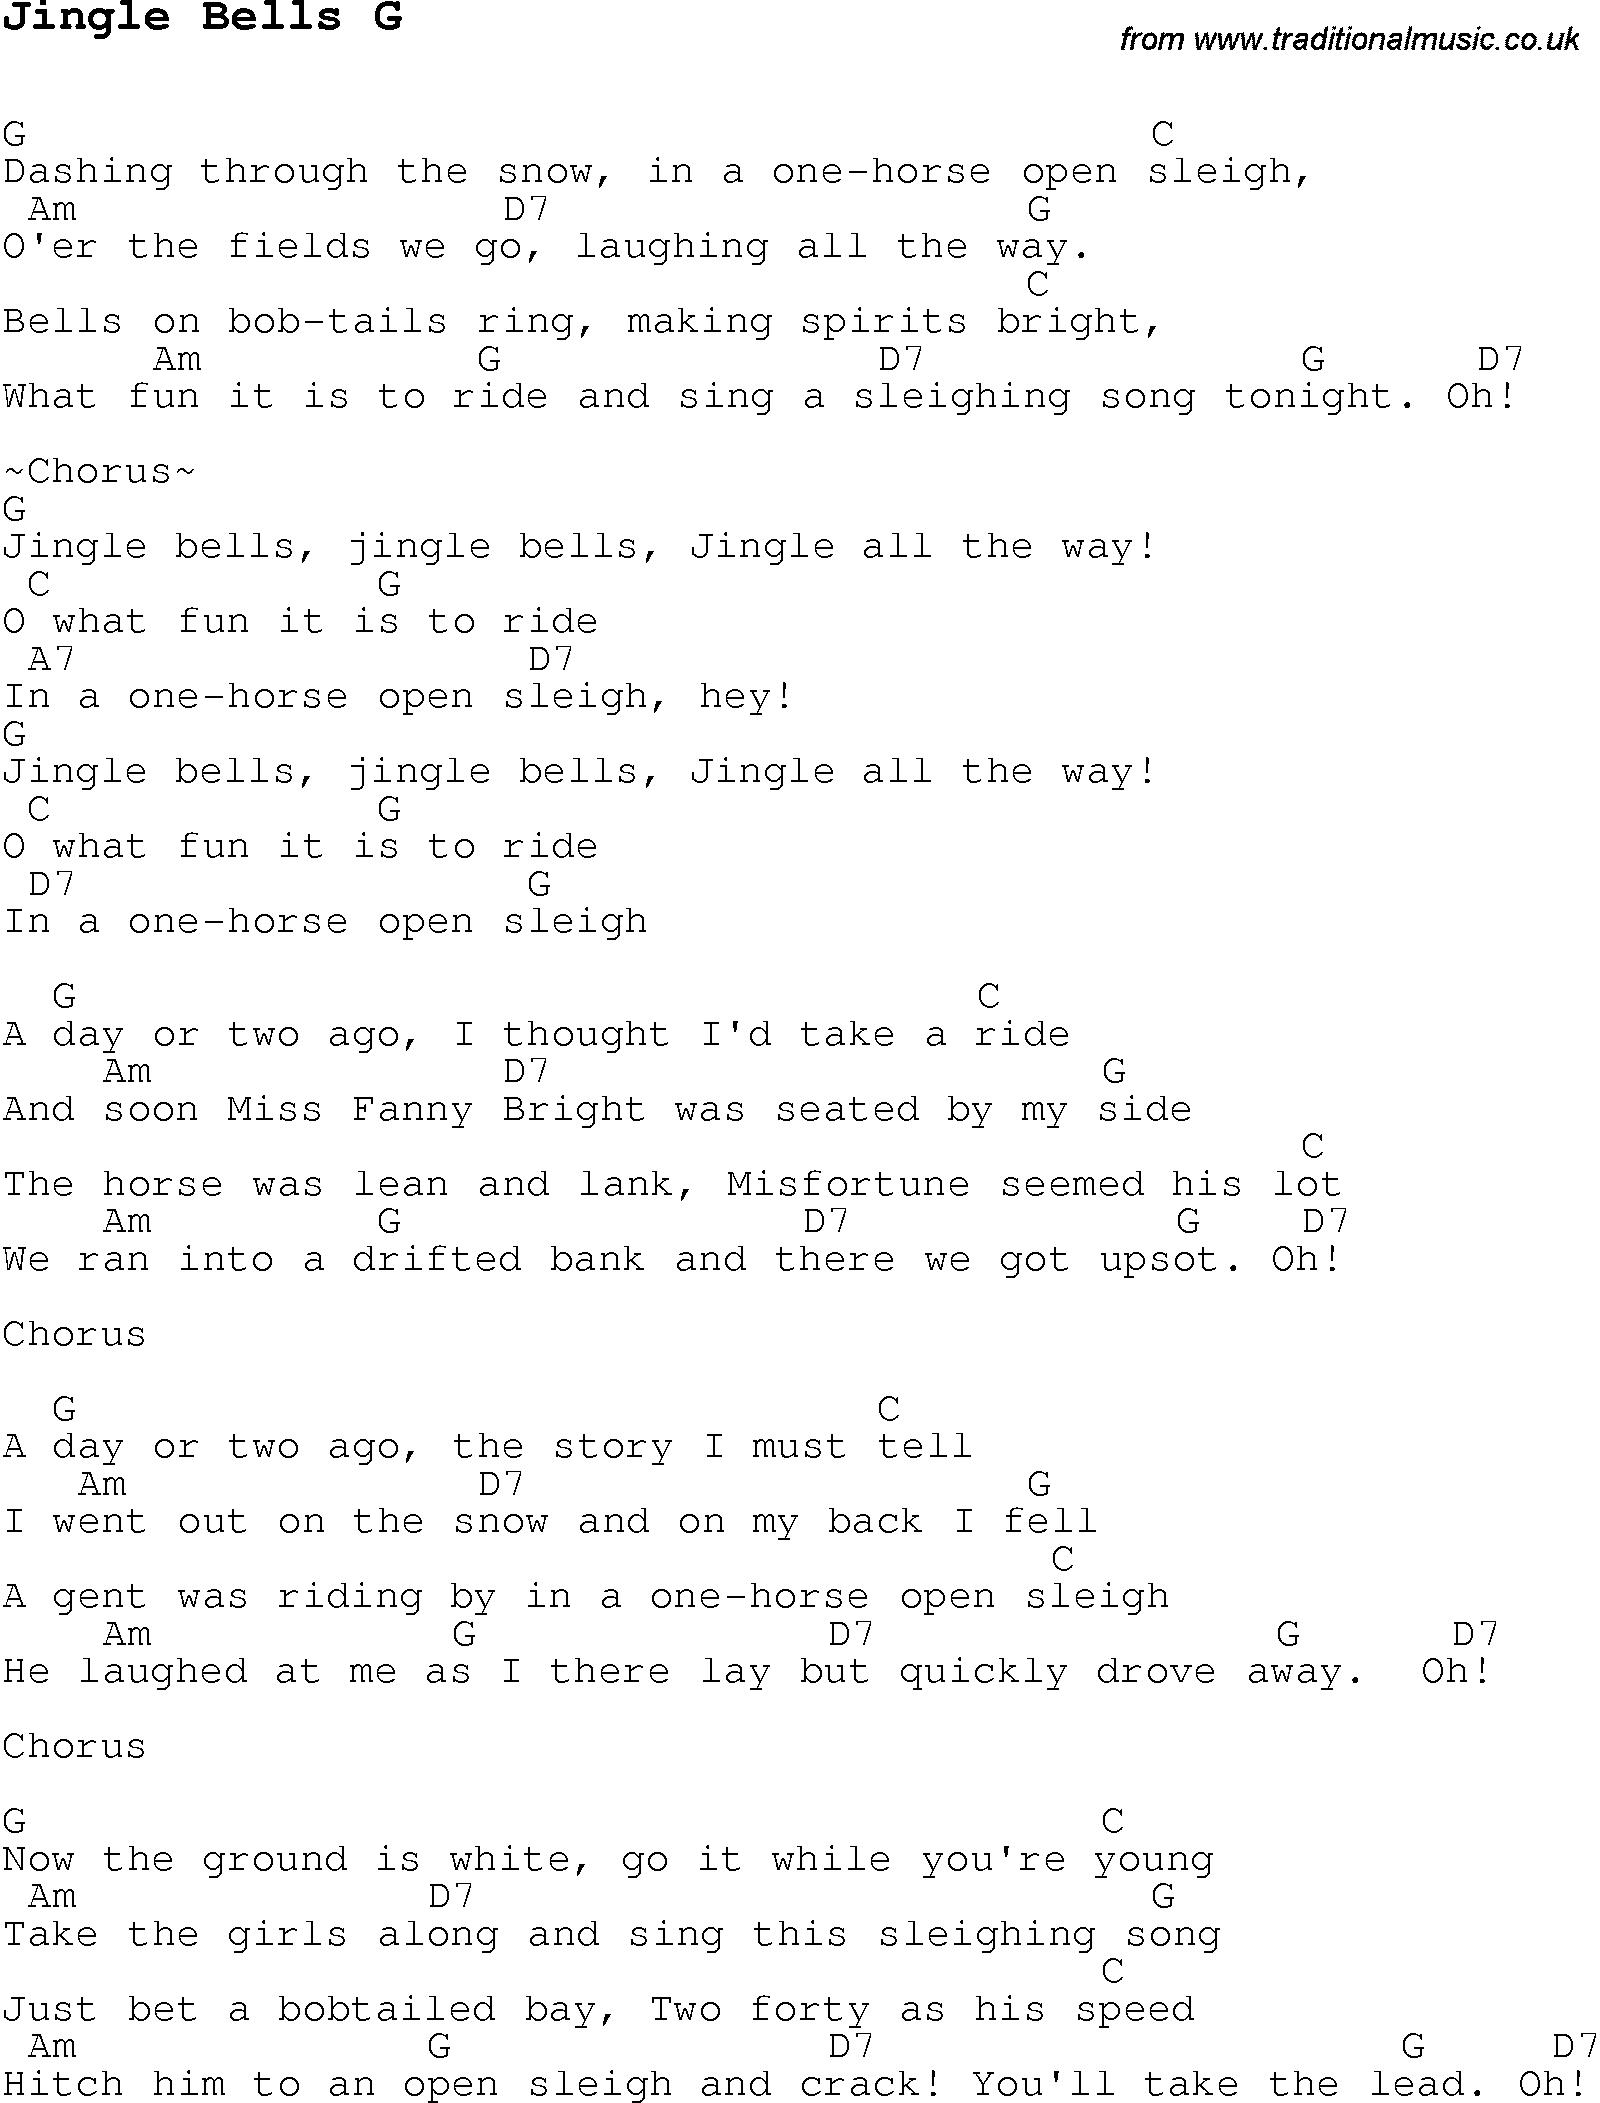 44 JINGLE BELLS GUITAR CHORDS PDF, JINGLE CHORDS BELLS PDF